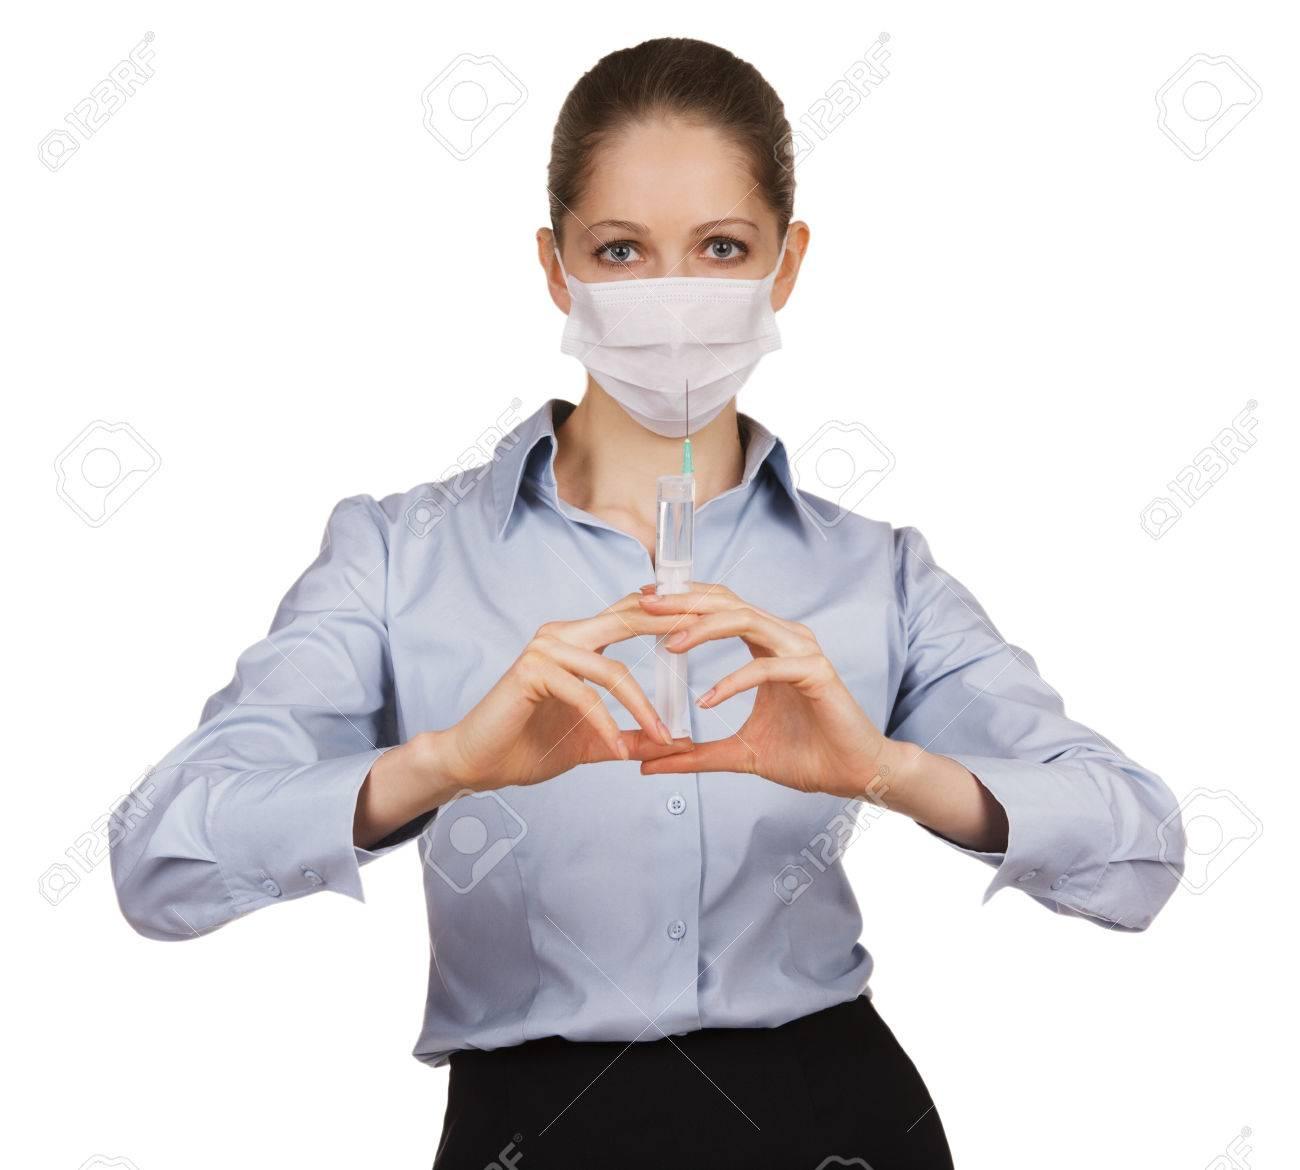 Girl in a medical mask holding syringe Stock Photo - 25088702